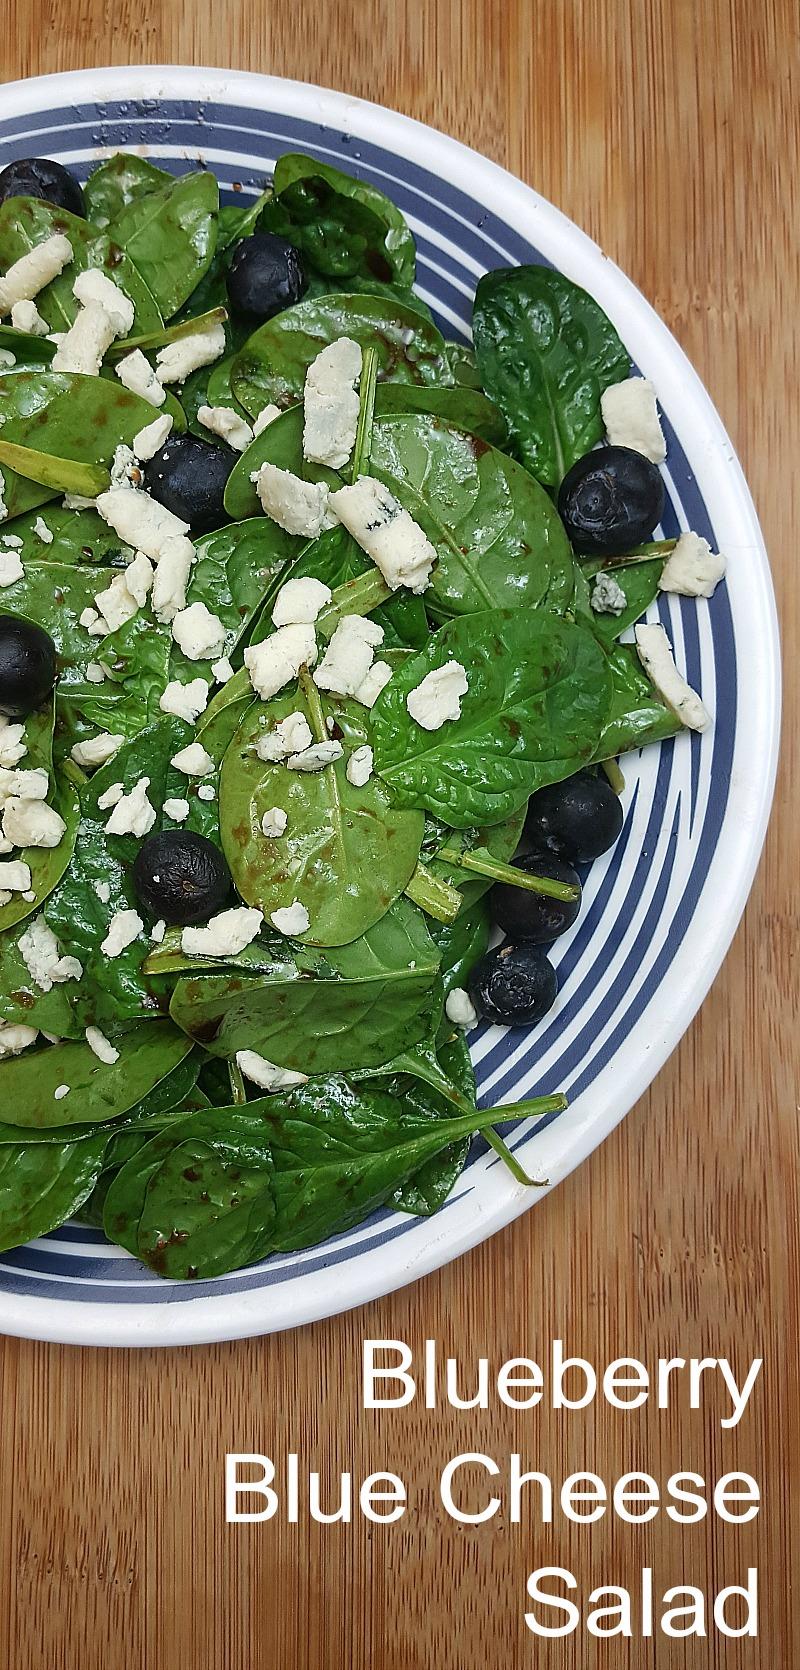 Blueberry Blue Cheese Salad Recipe